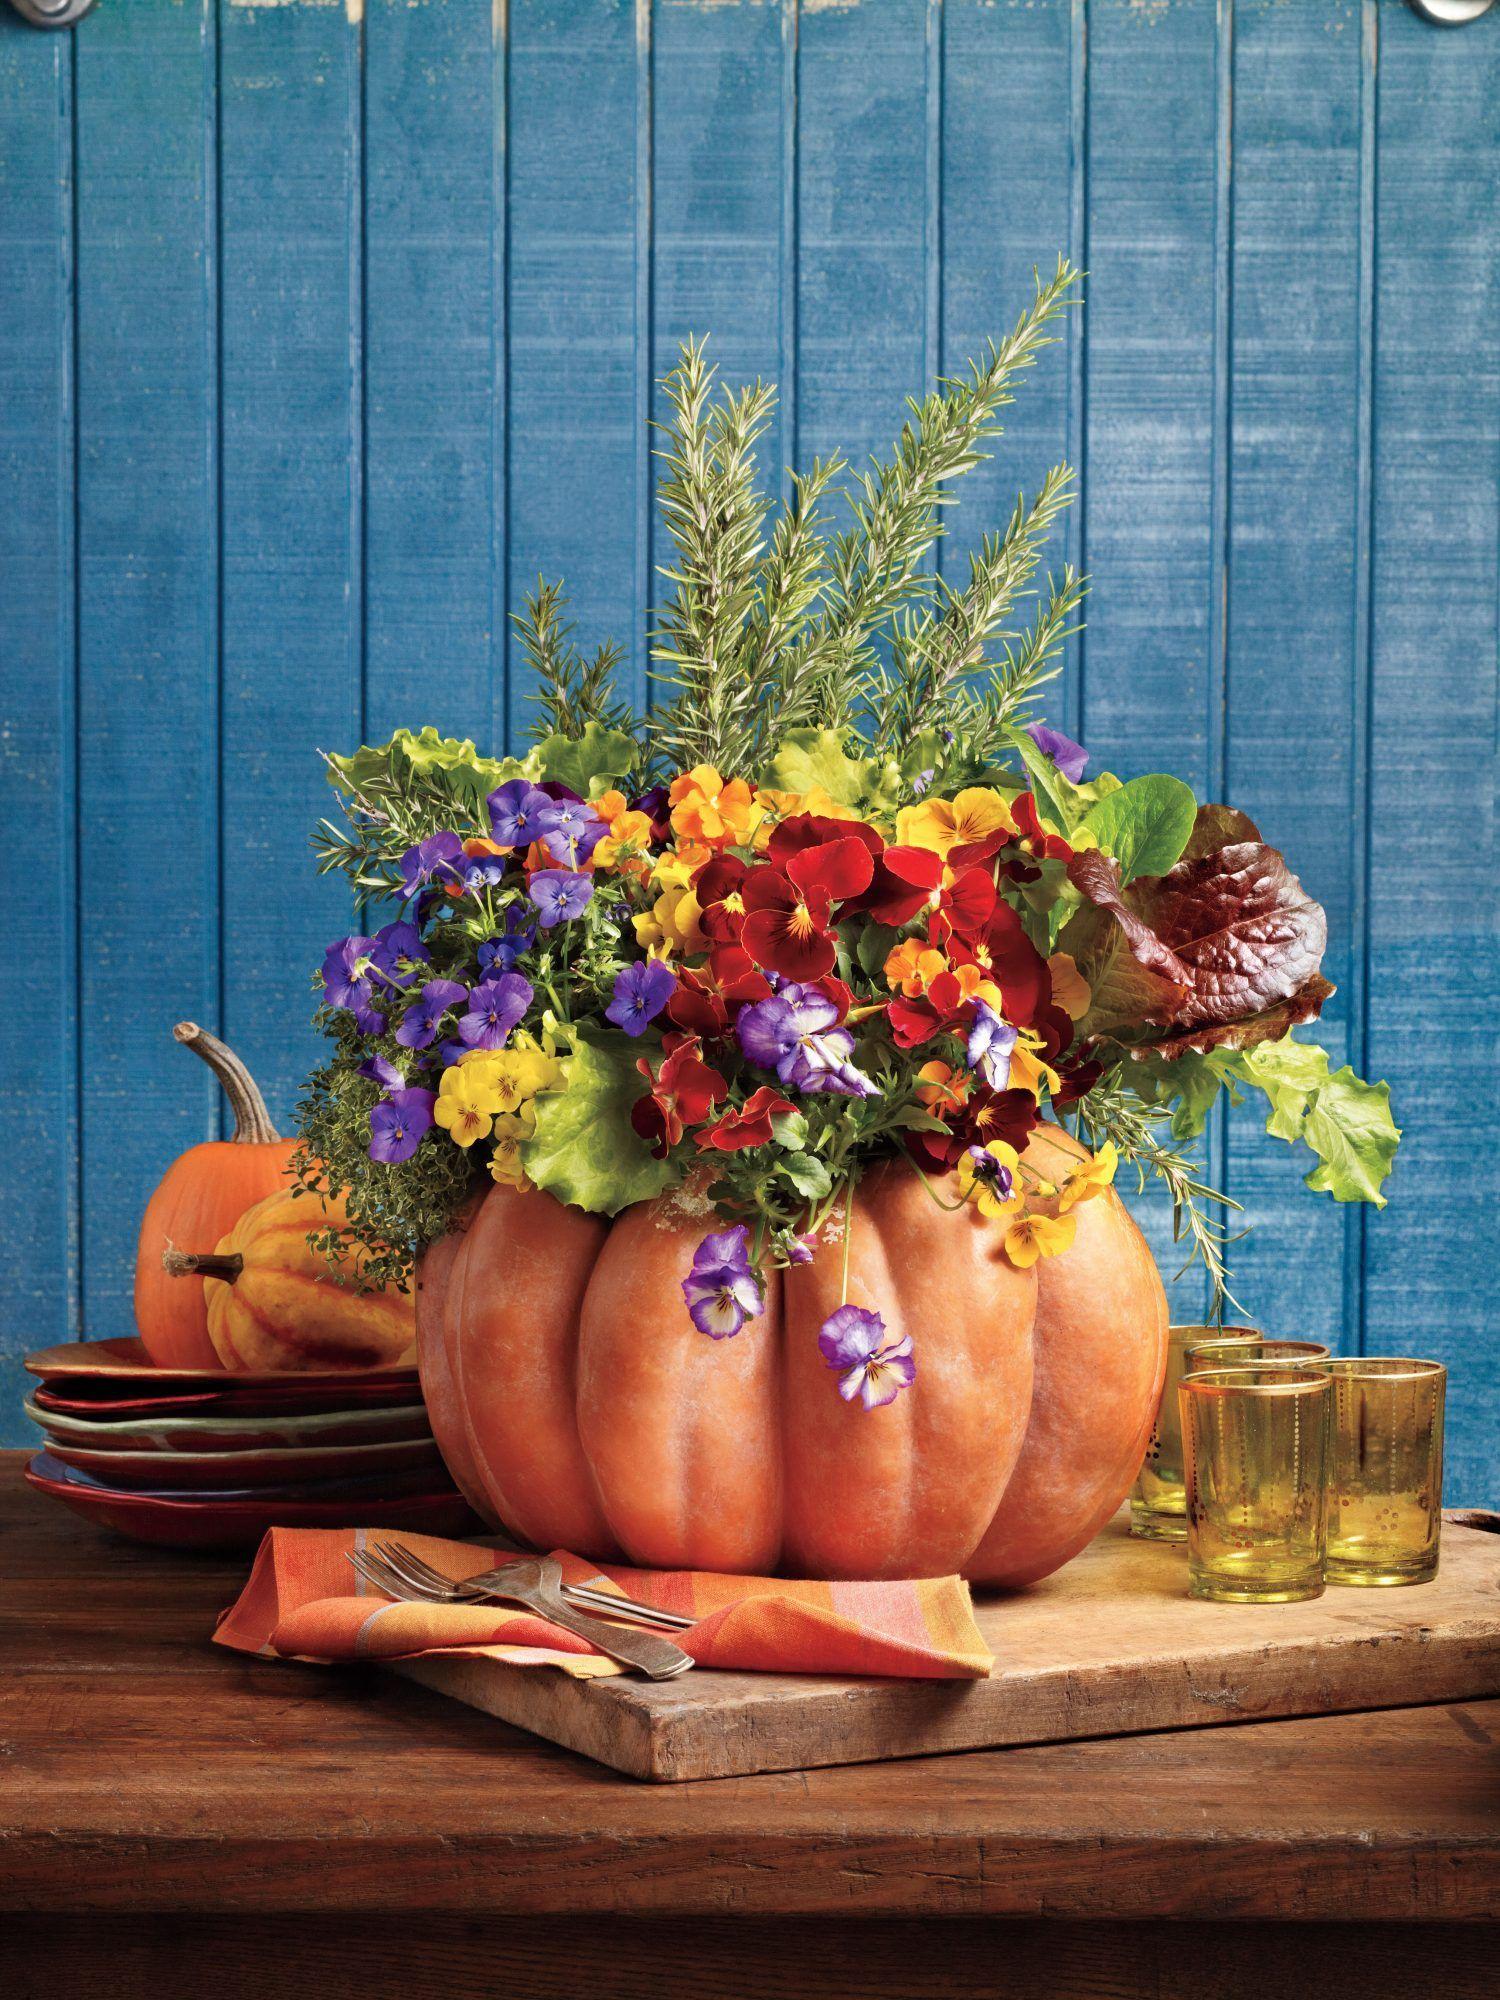 Autumn Centerpieces To Complete Your Fall Feast Creative Pumpkin Decorating Fall Outdoor Decor Pumpkin Decorating